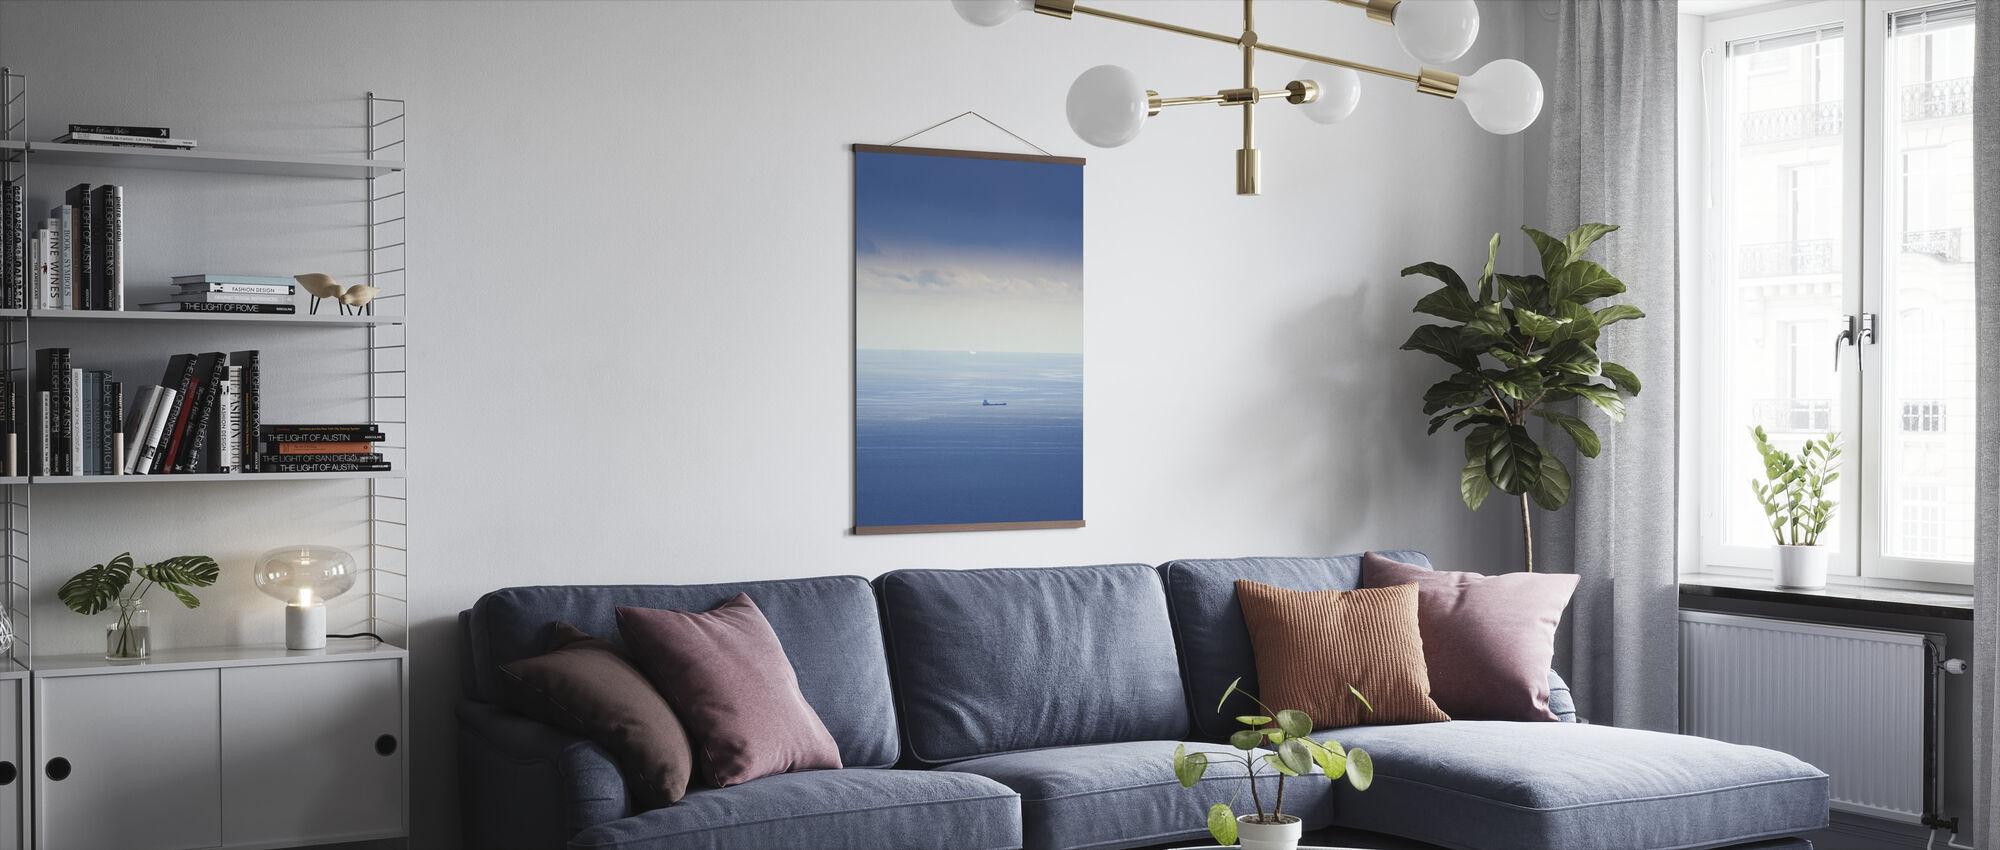 Ship in Mediterranean Sea - Poster - Living Room